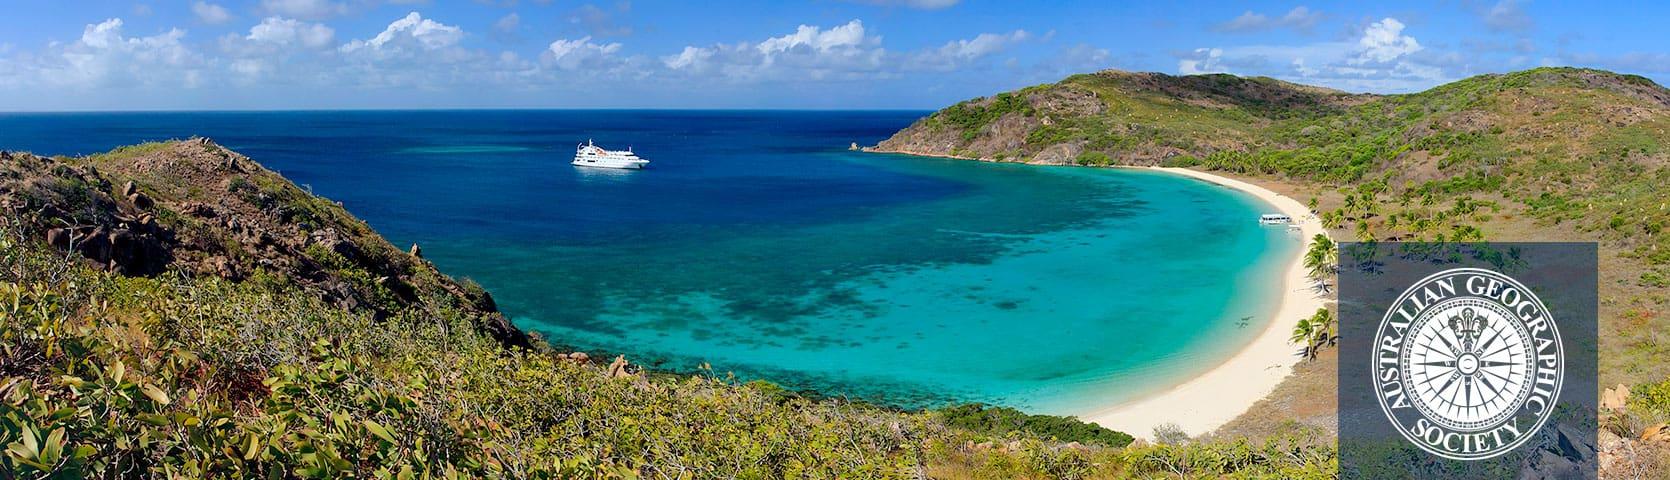 Torres-Strait-Cape-York-Cruise-Australian-Geographic